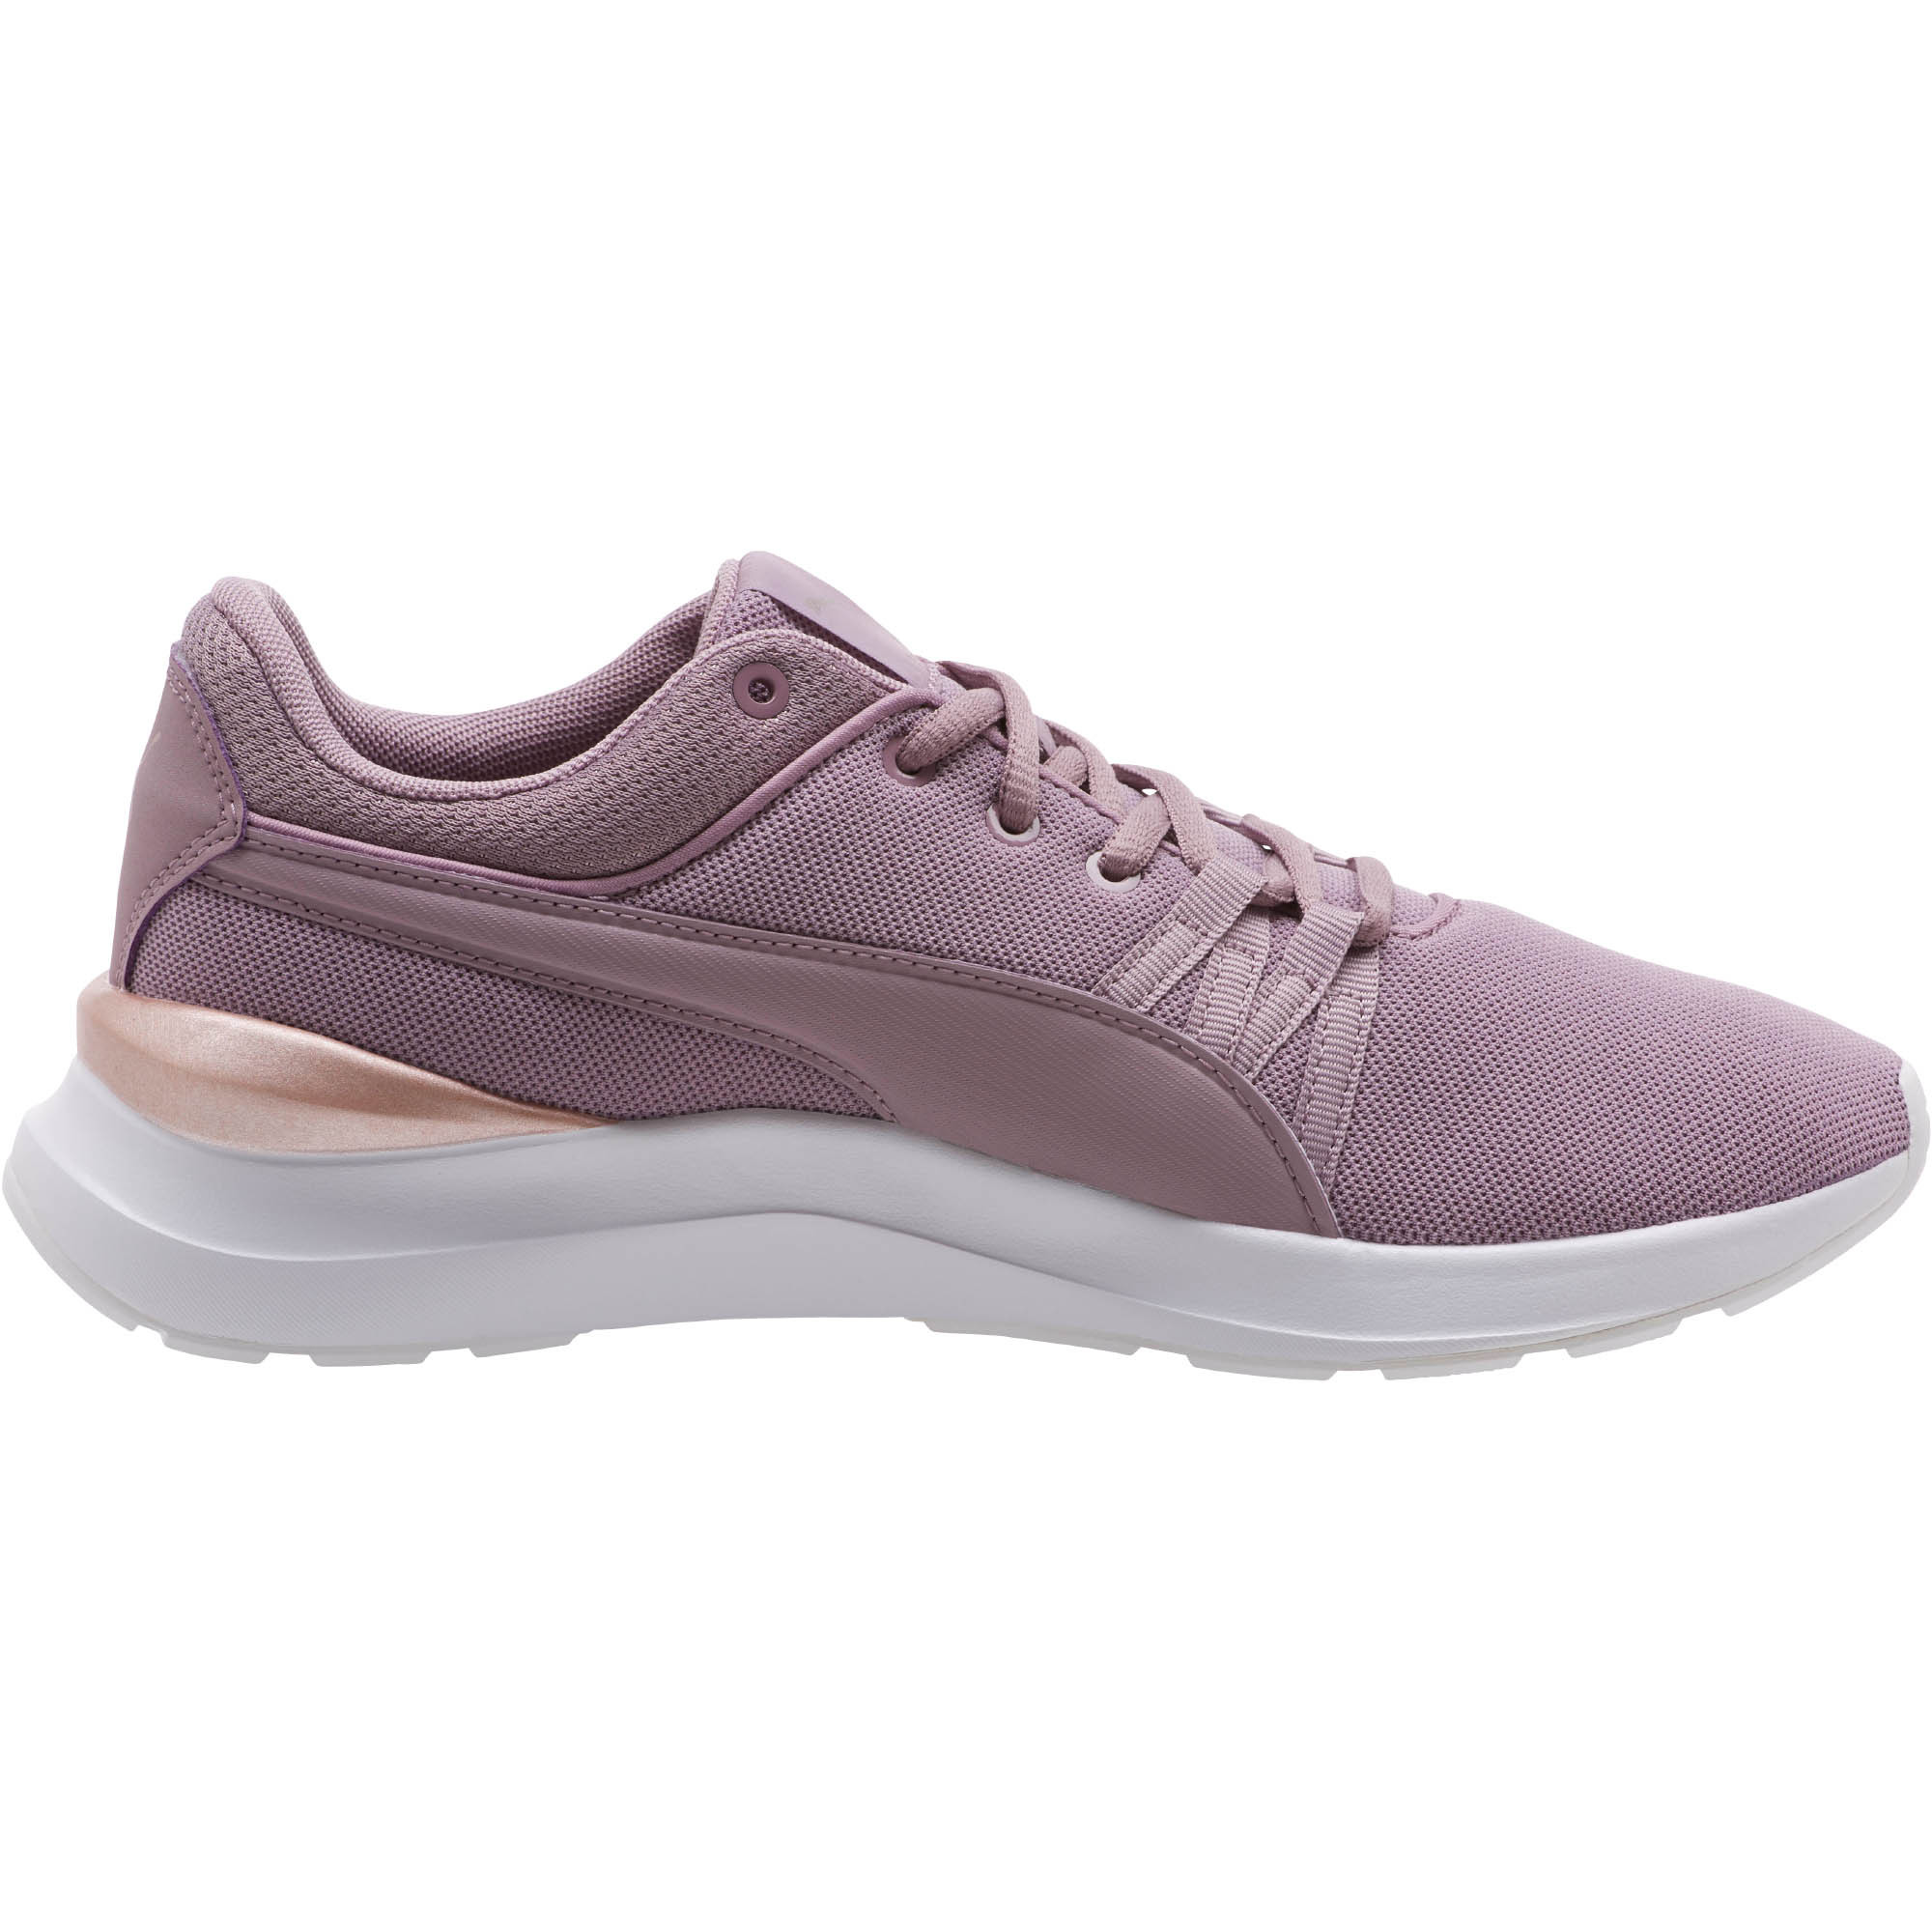 PUMA-Adela-Mesh-Women-s-Sneakers-Women-Shoe-Basics thumbnail 5